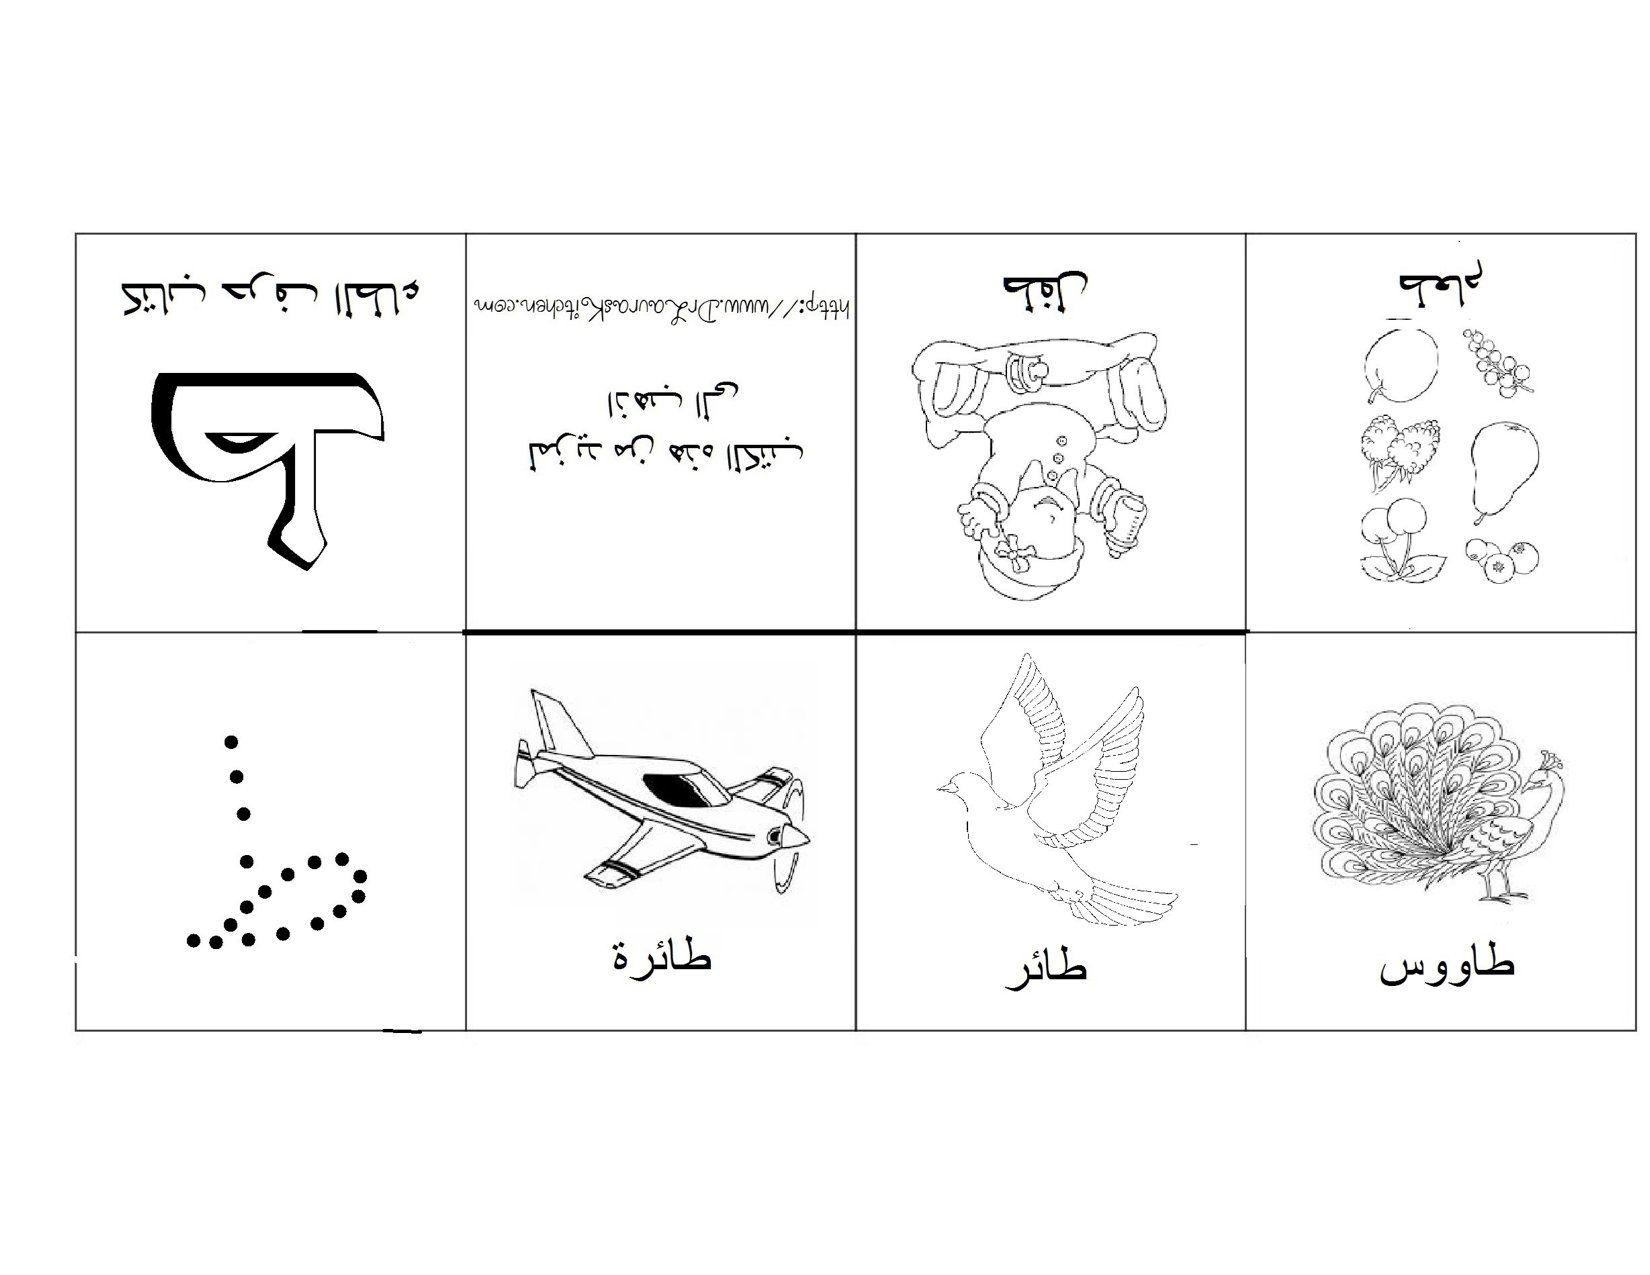 عل مني On Twitter Teach Arabic Activities For Kids Teaching